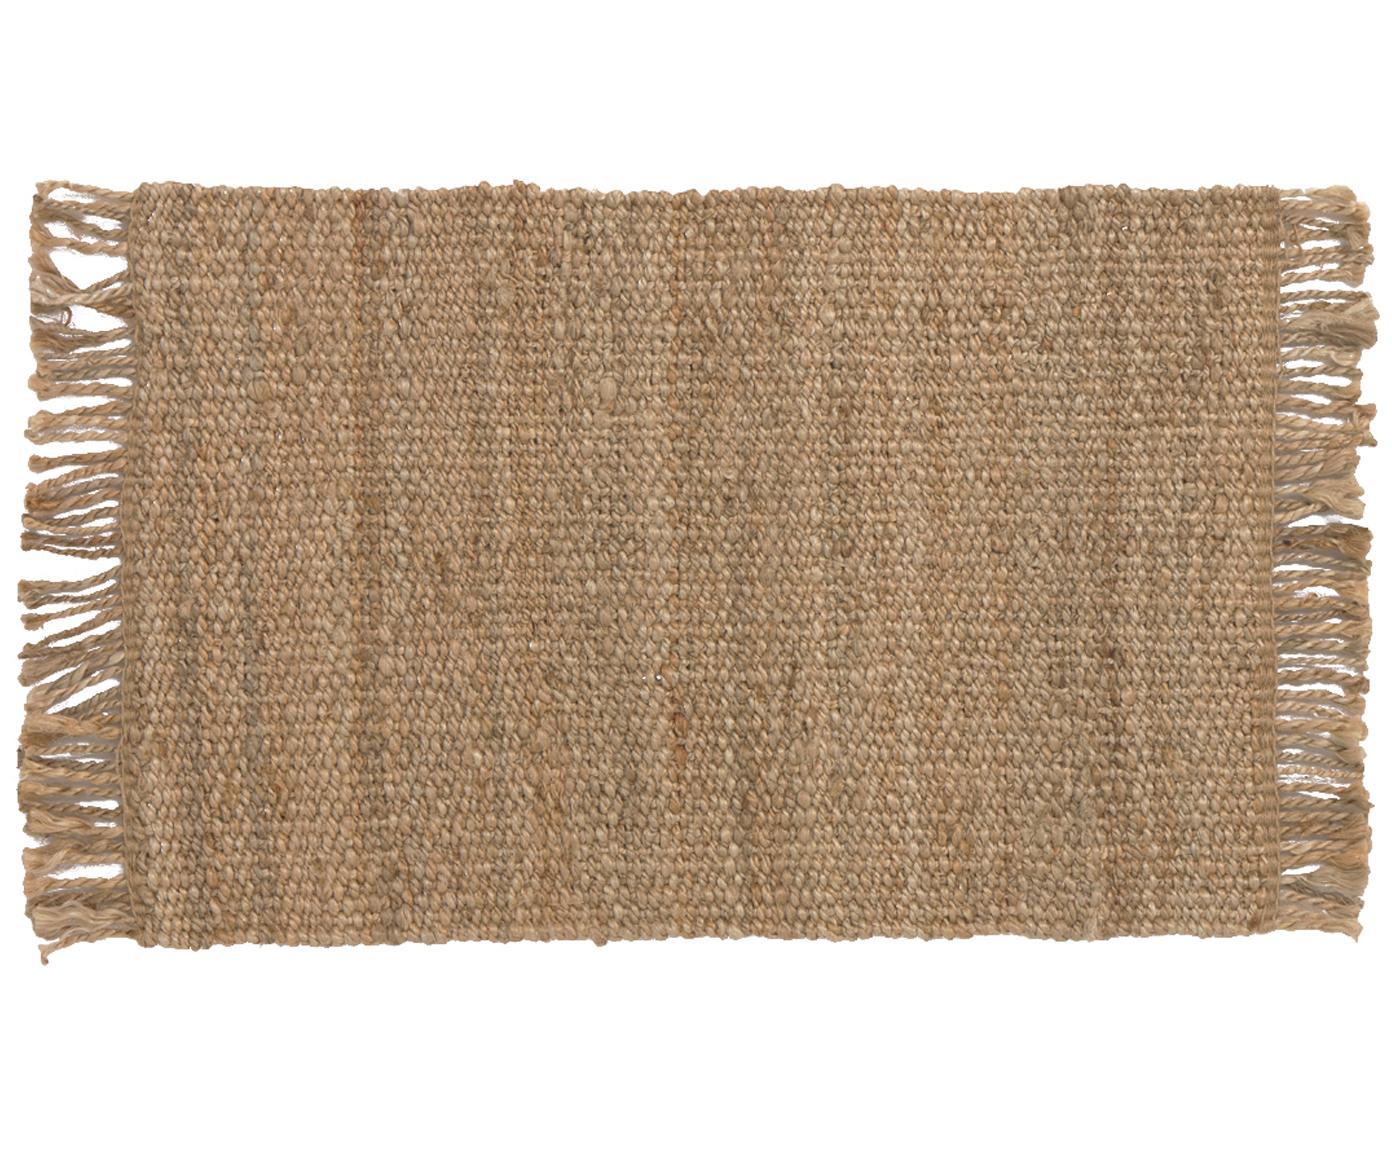 Alfombra artesanal de yute con flecos Cadiz, Yute, Yute, An 150 x L 200 cm (Tamaño S)